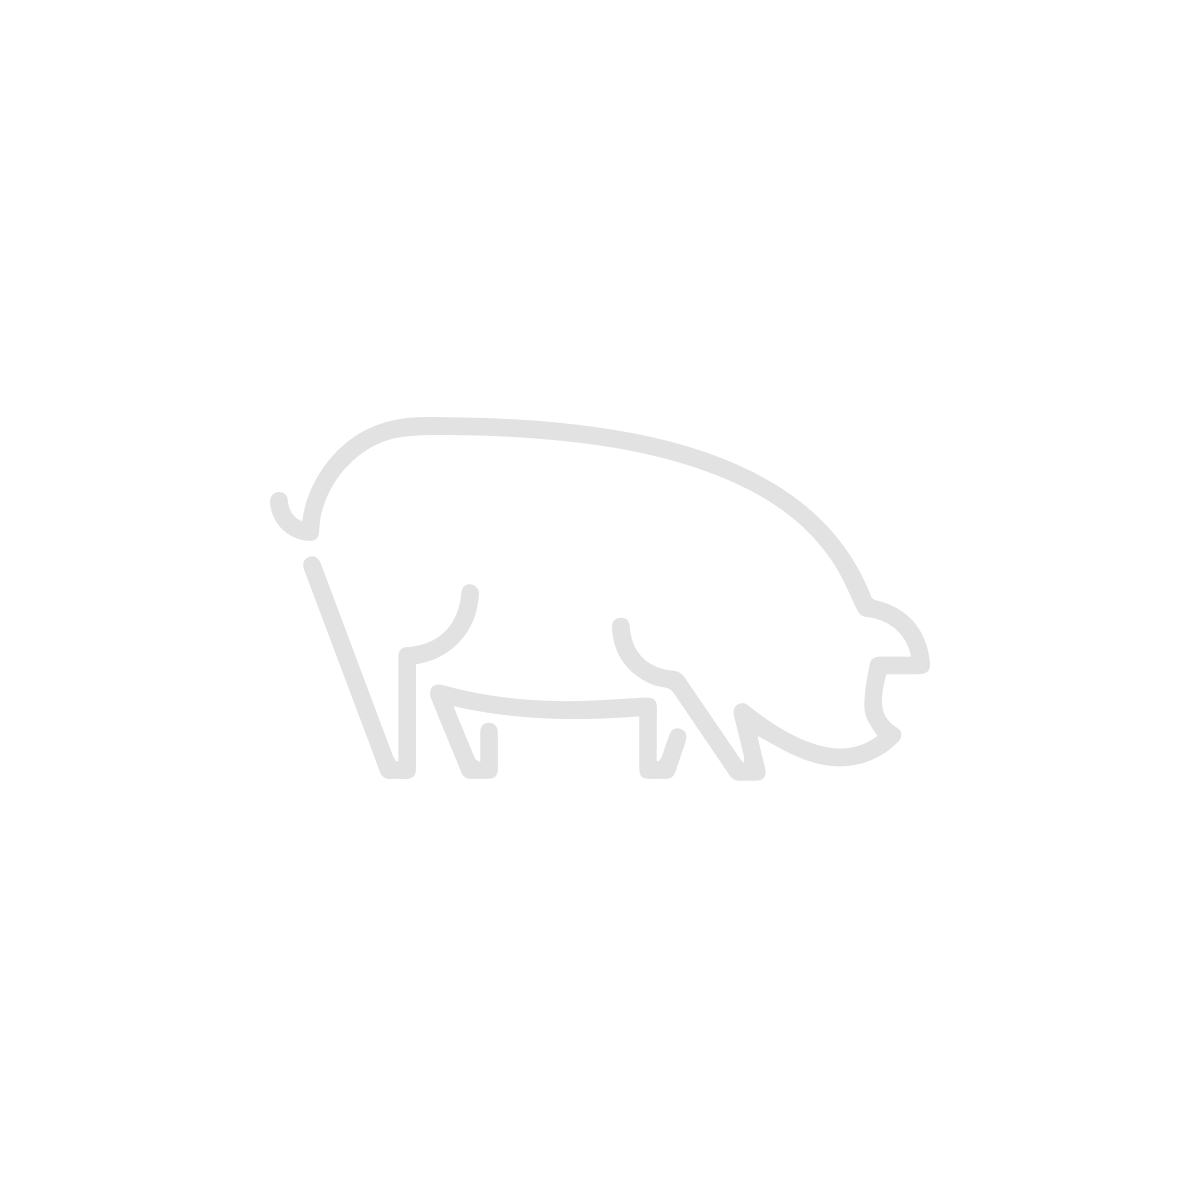 Đakovačka Pečenica/Kare od Crne slavonske svinje Placeholder